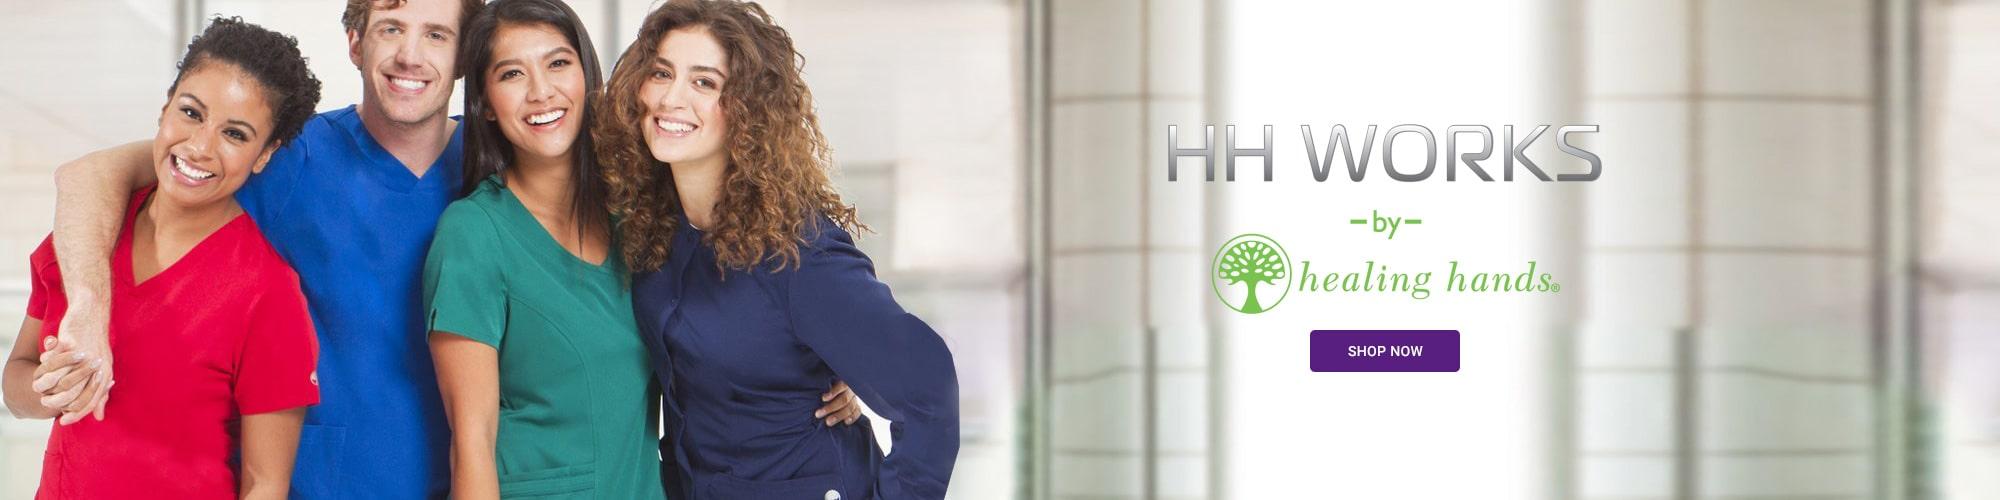 healinghands-hhworks